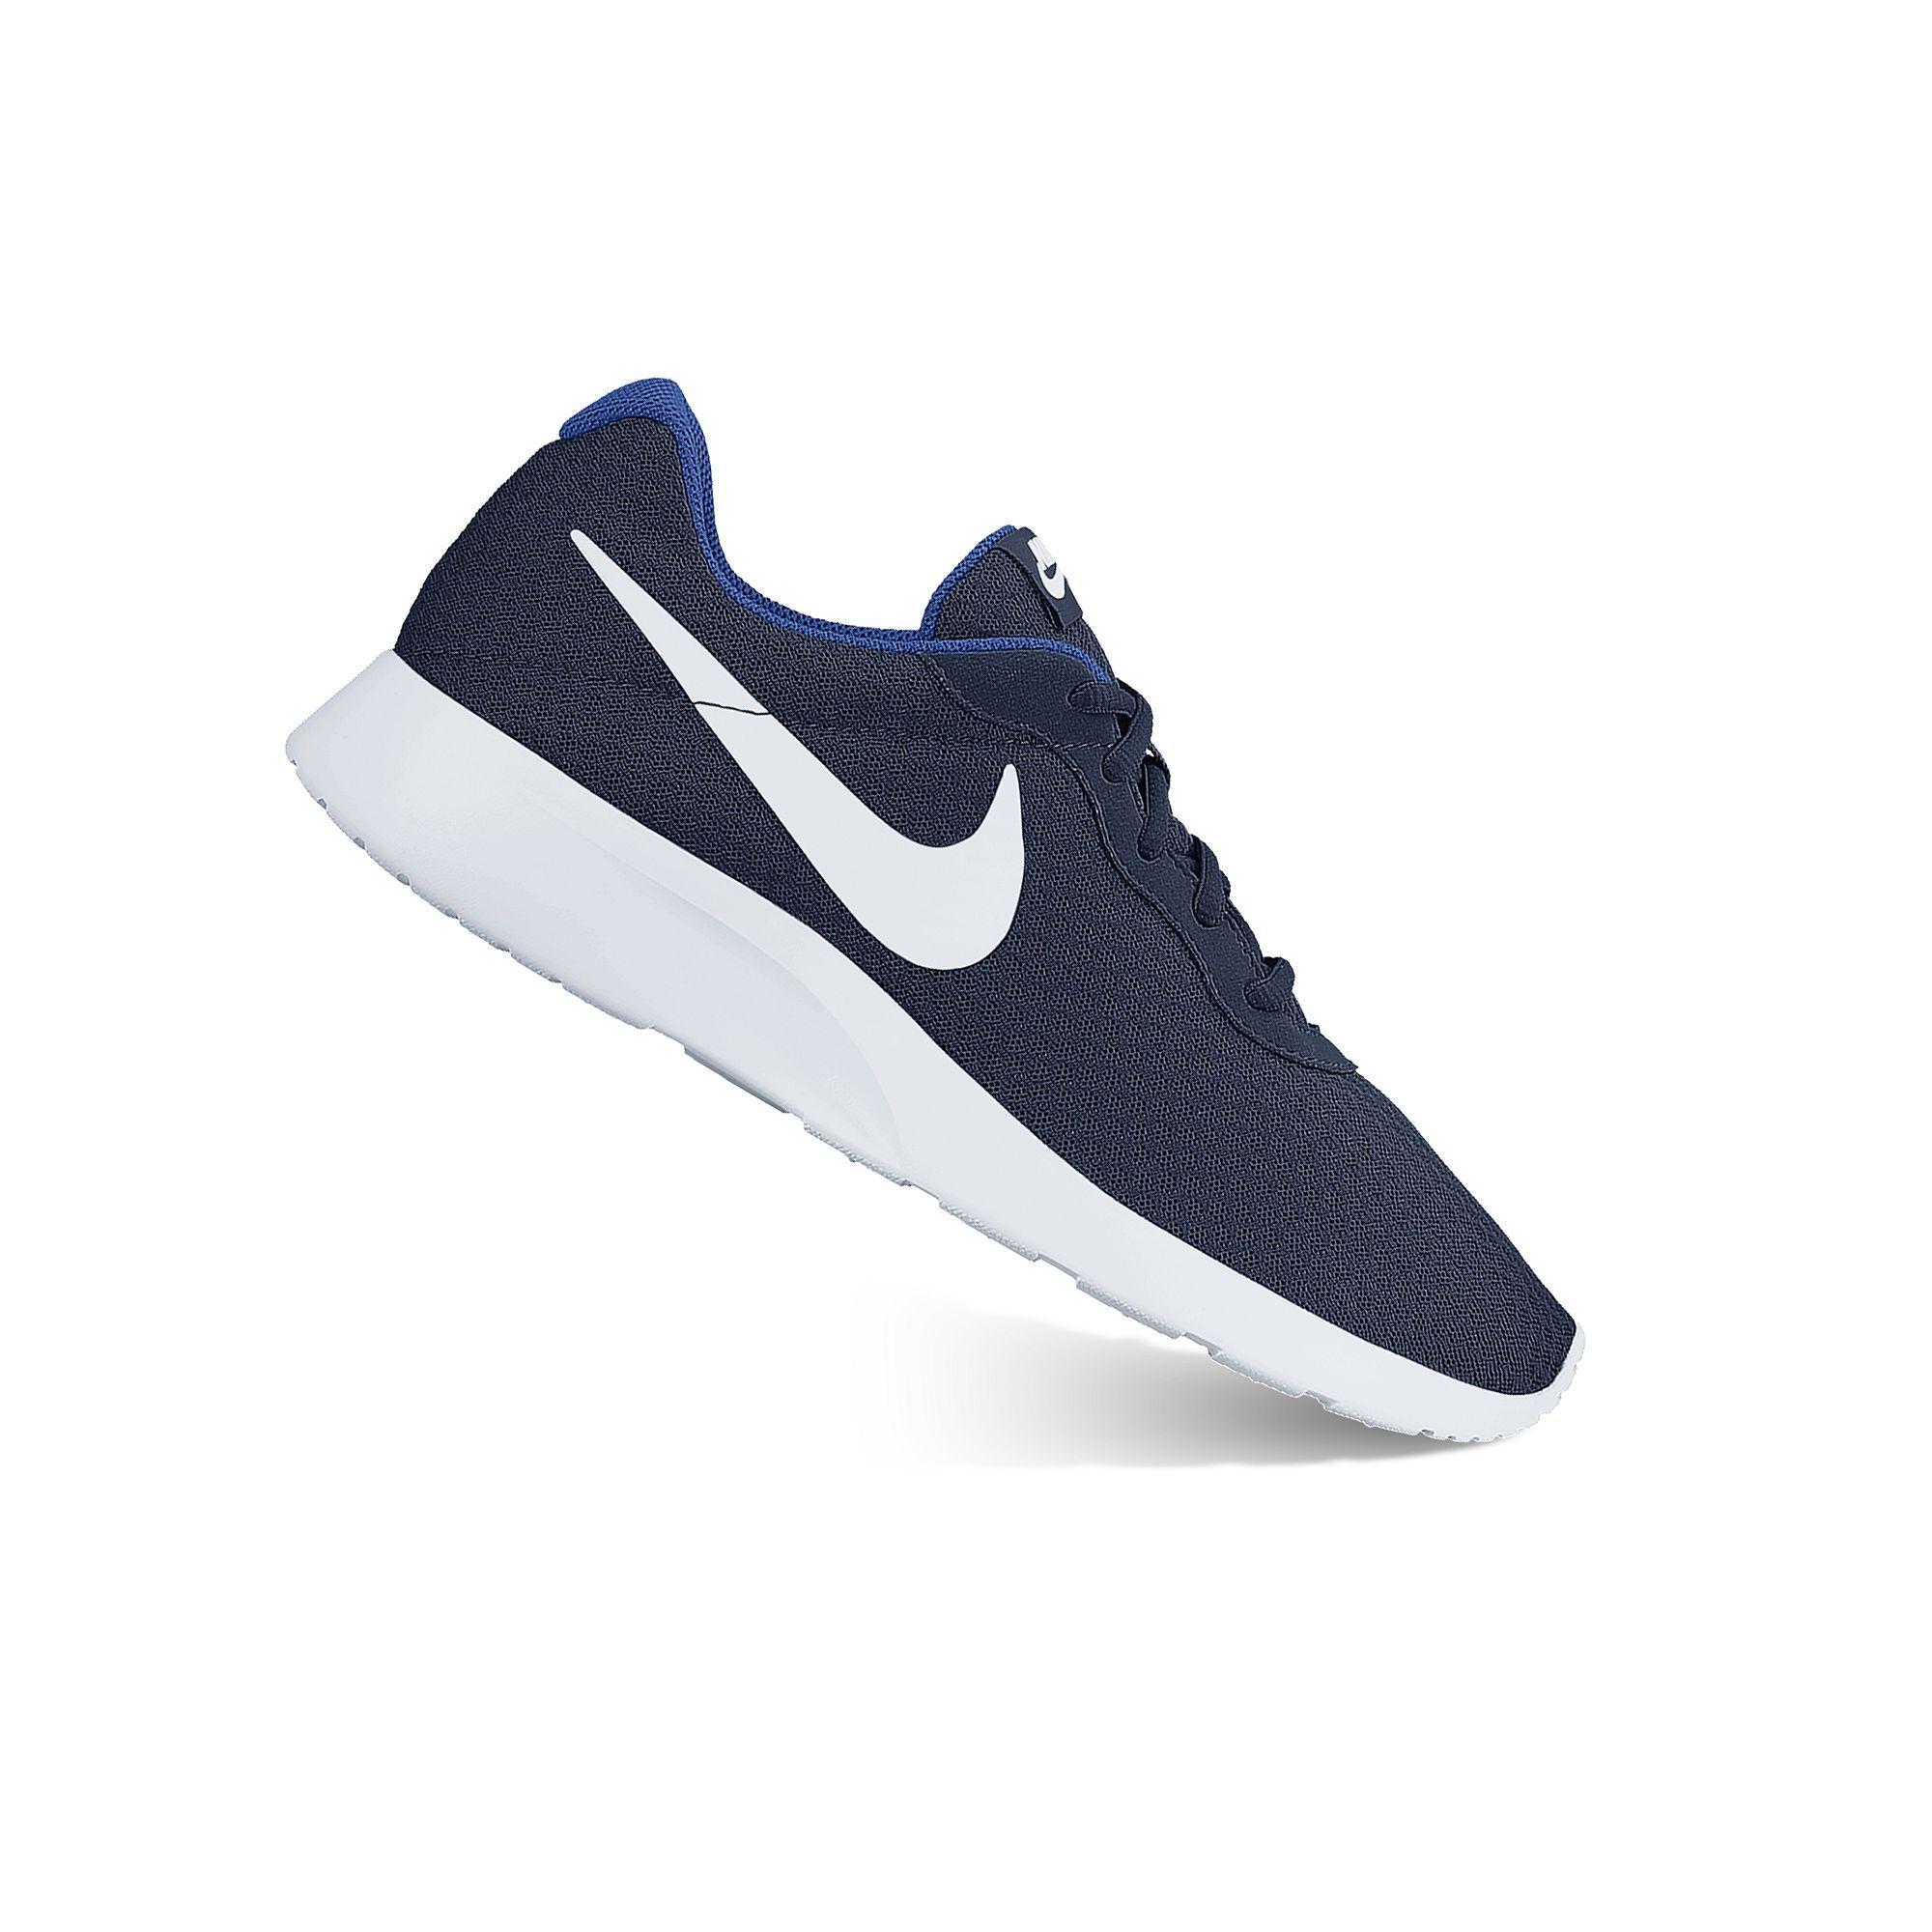 Nike Tanjun Men's Athletic Shoes | Nike